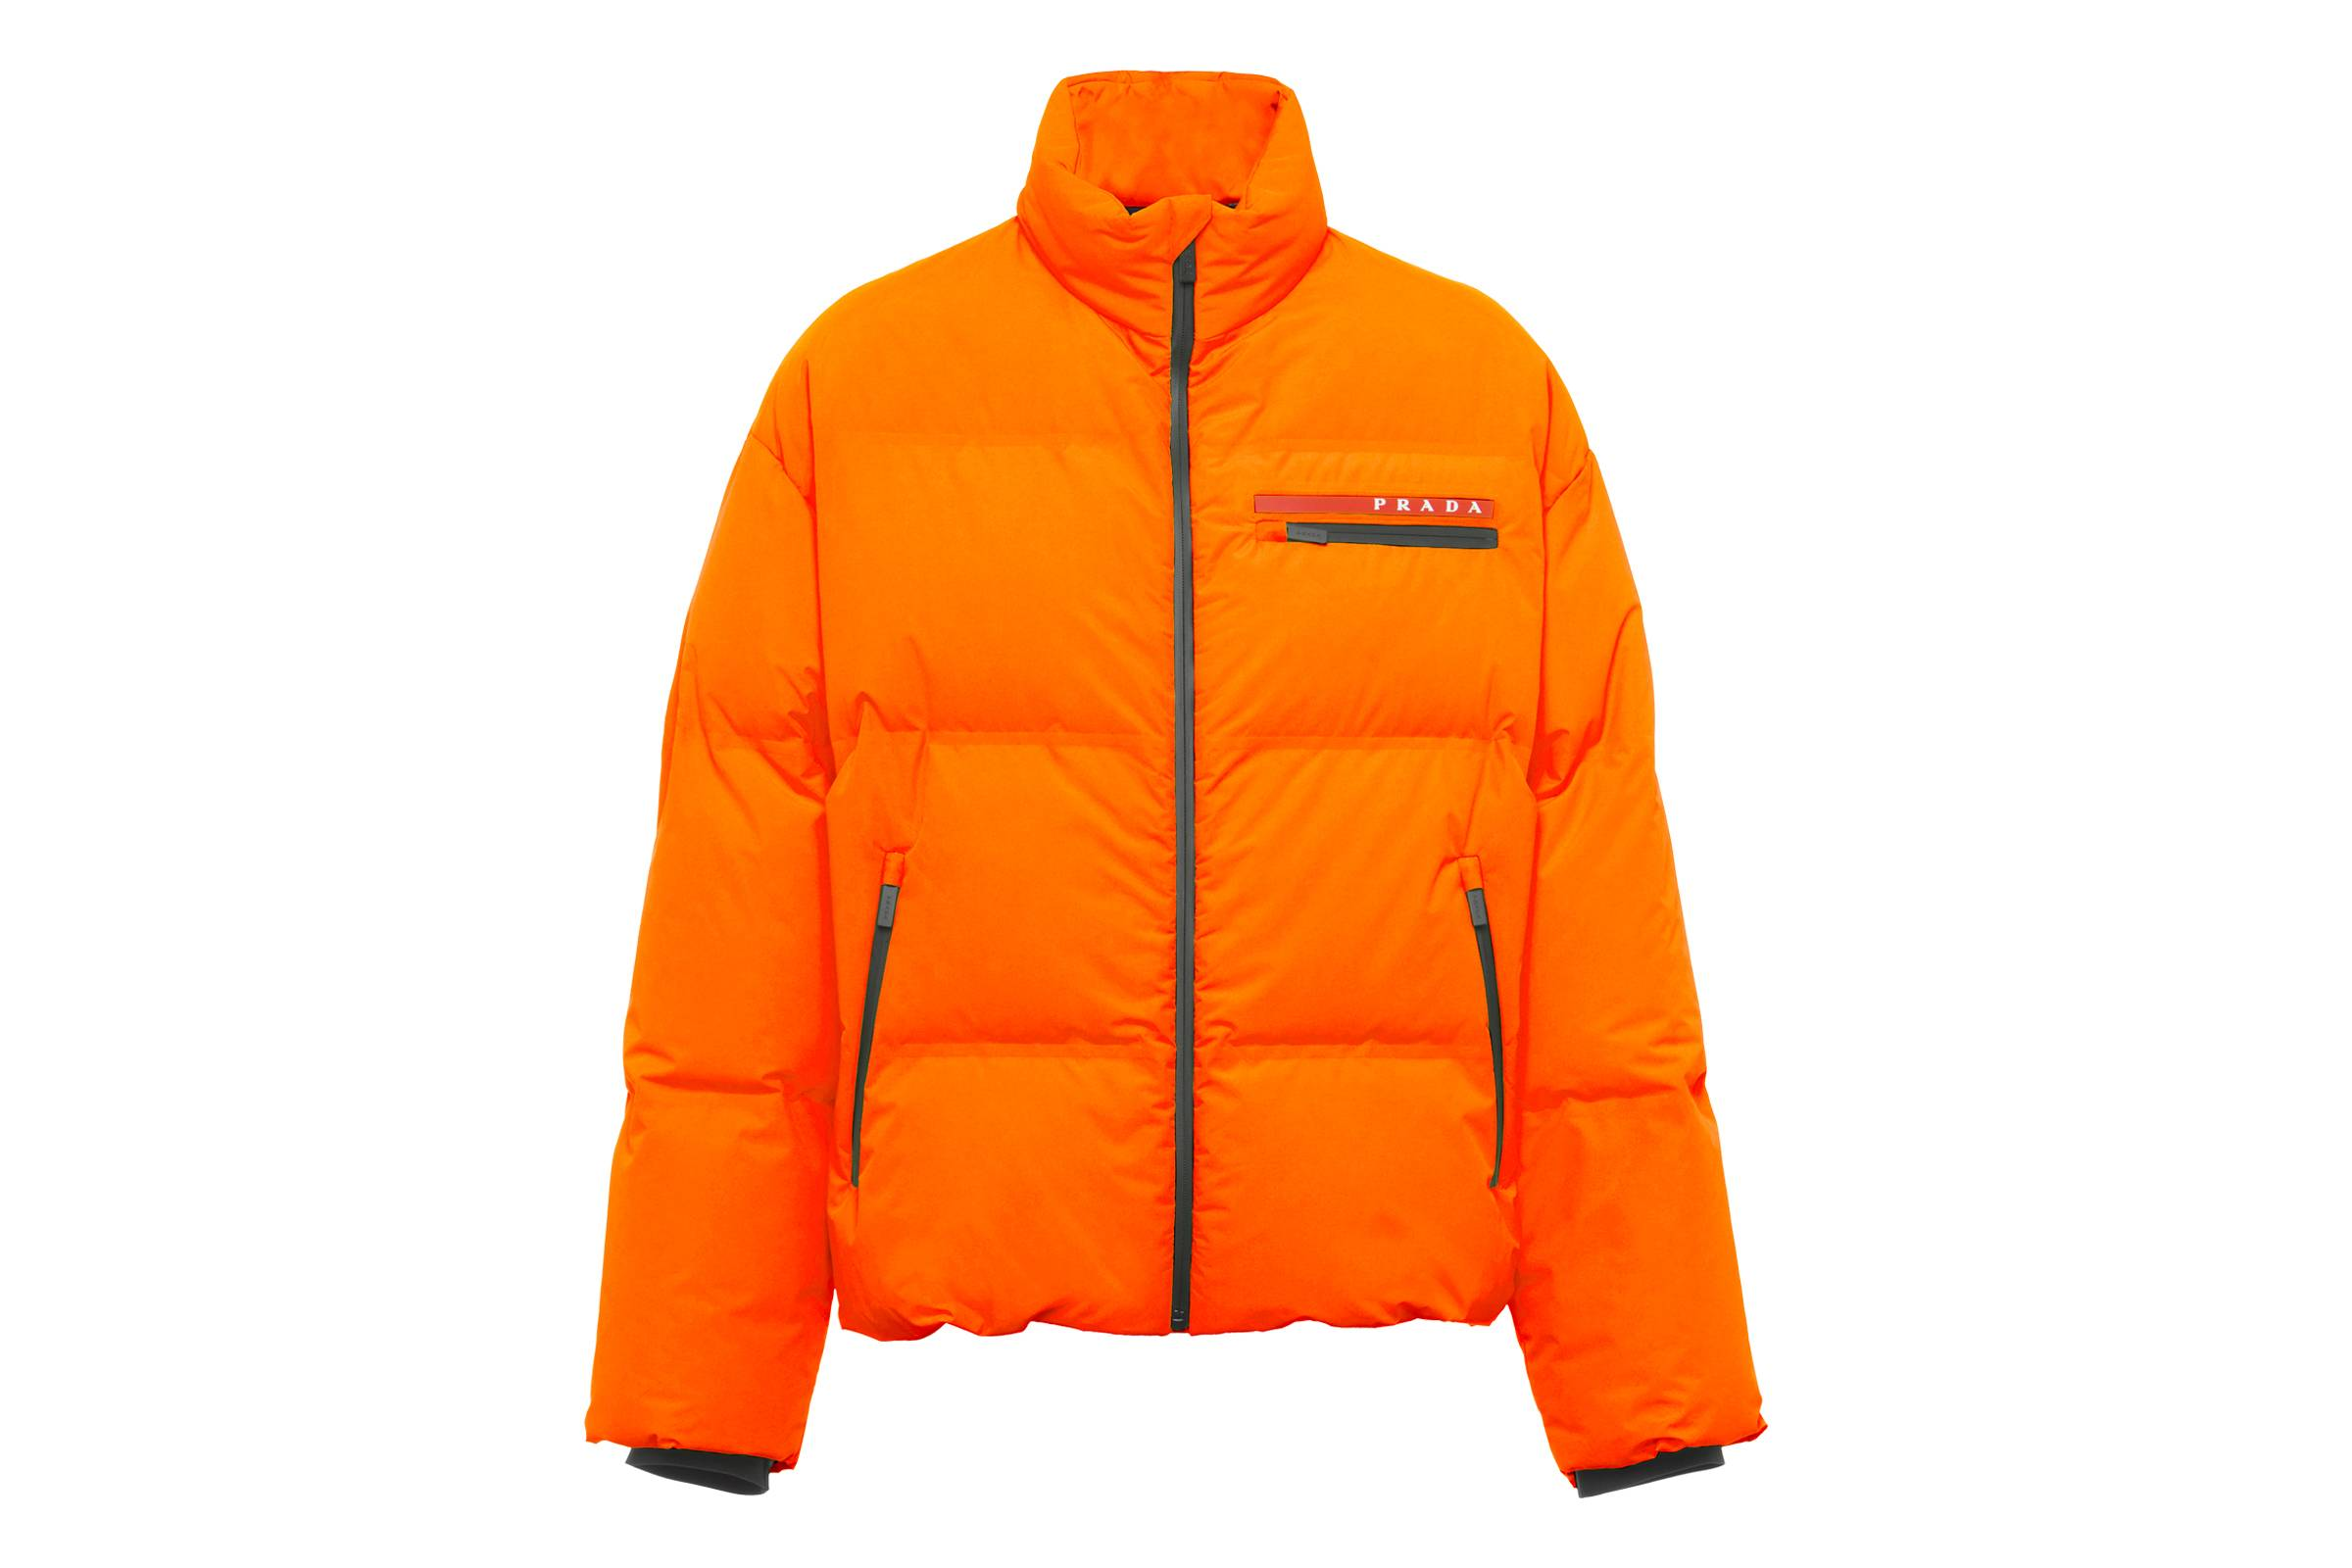 Prada Linea Rossa LR-HX015 Padded Jacket